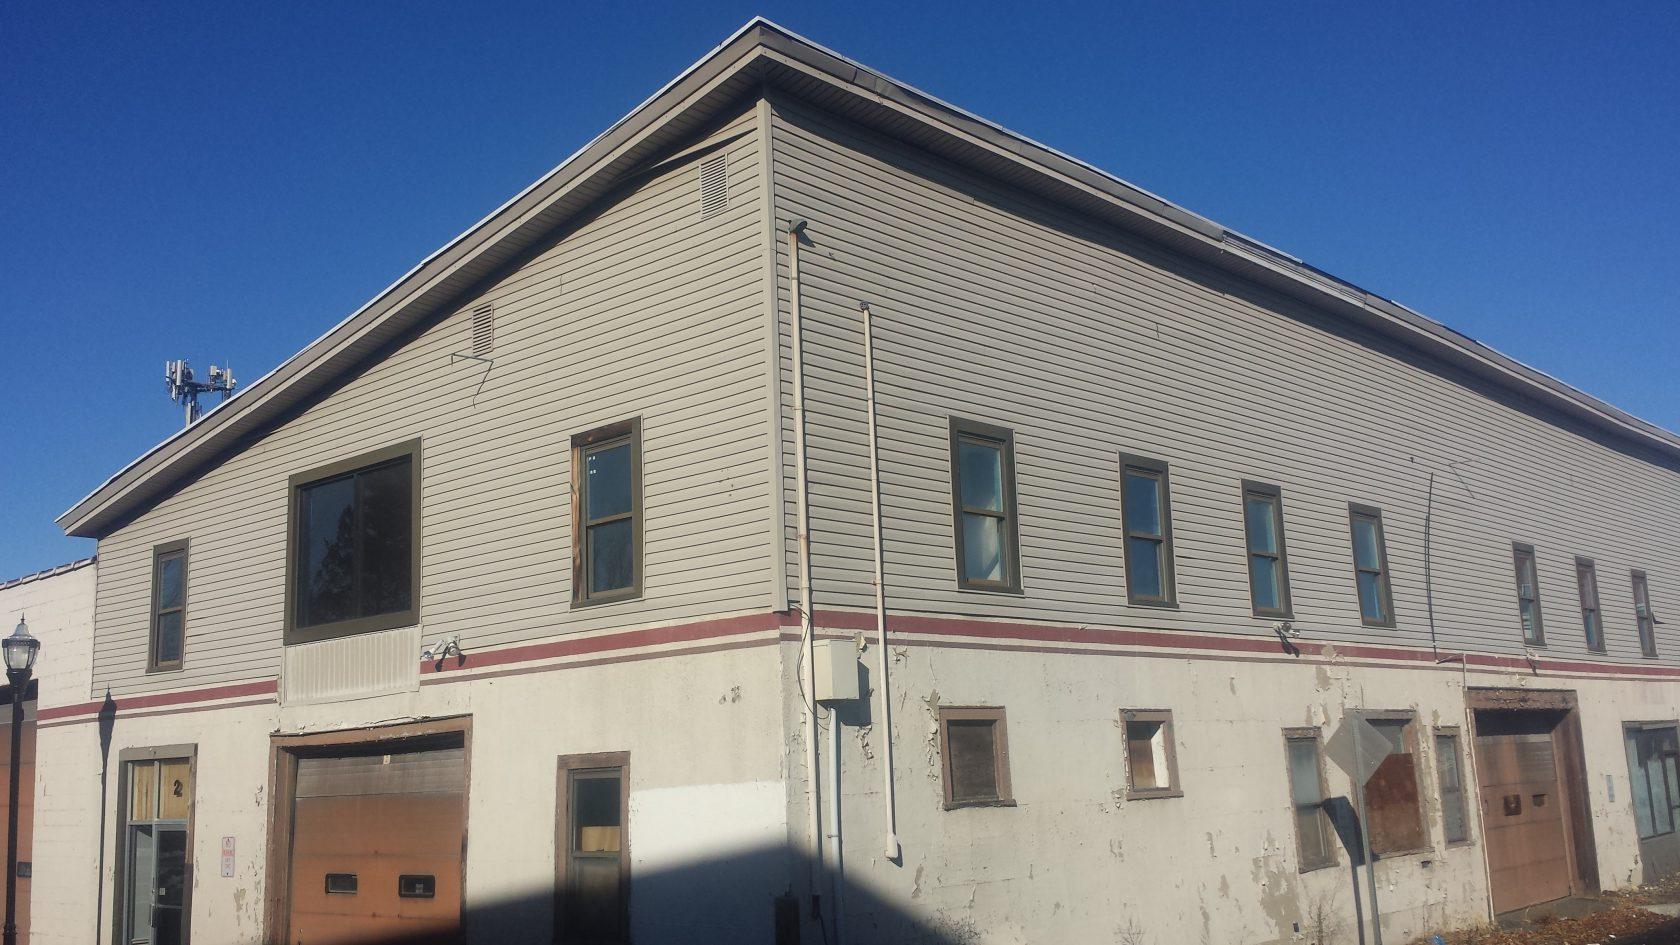 City seeks bids for demolition